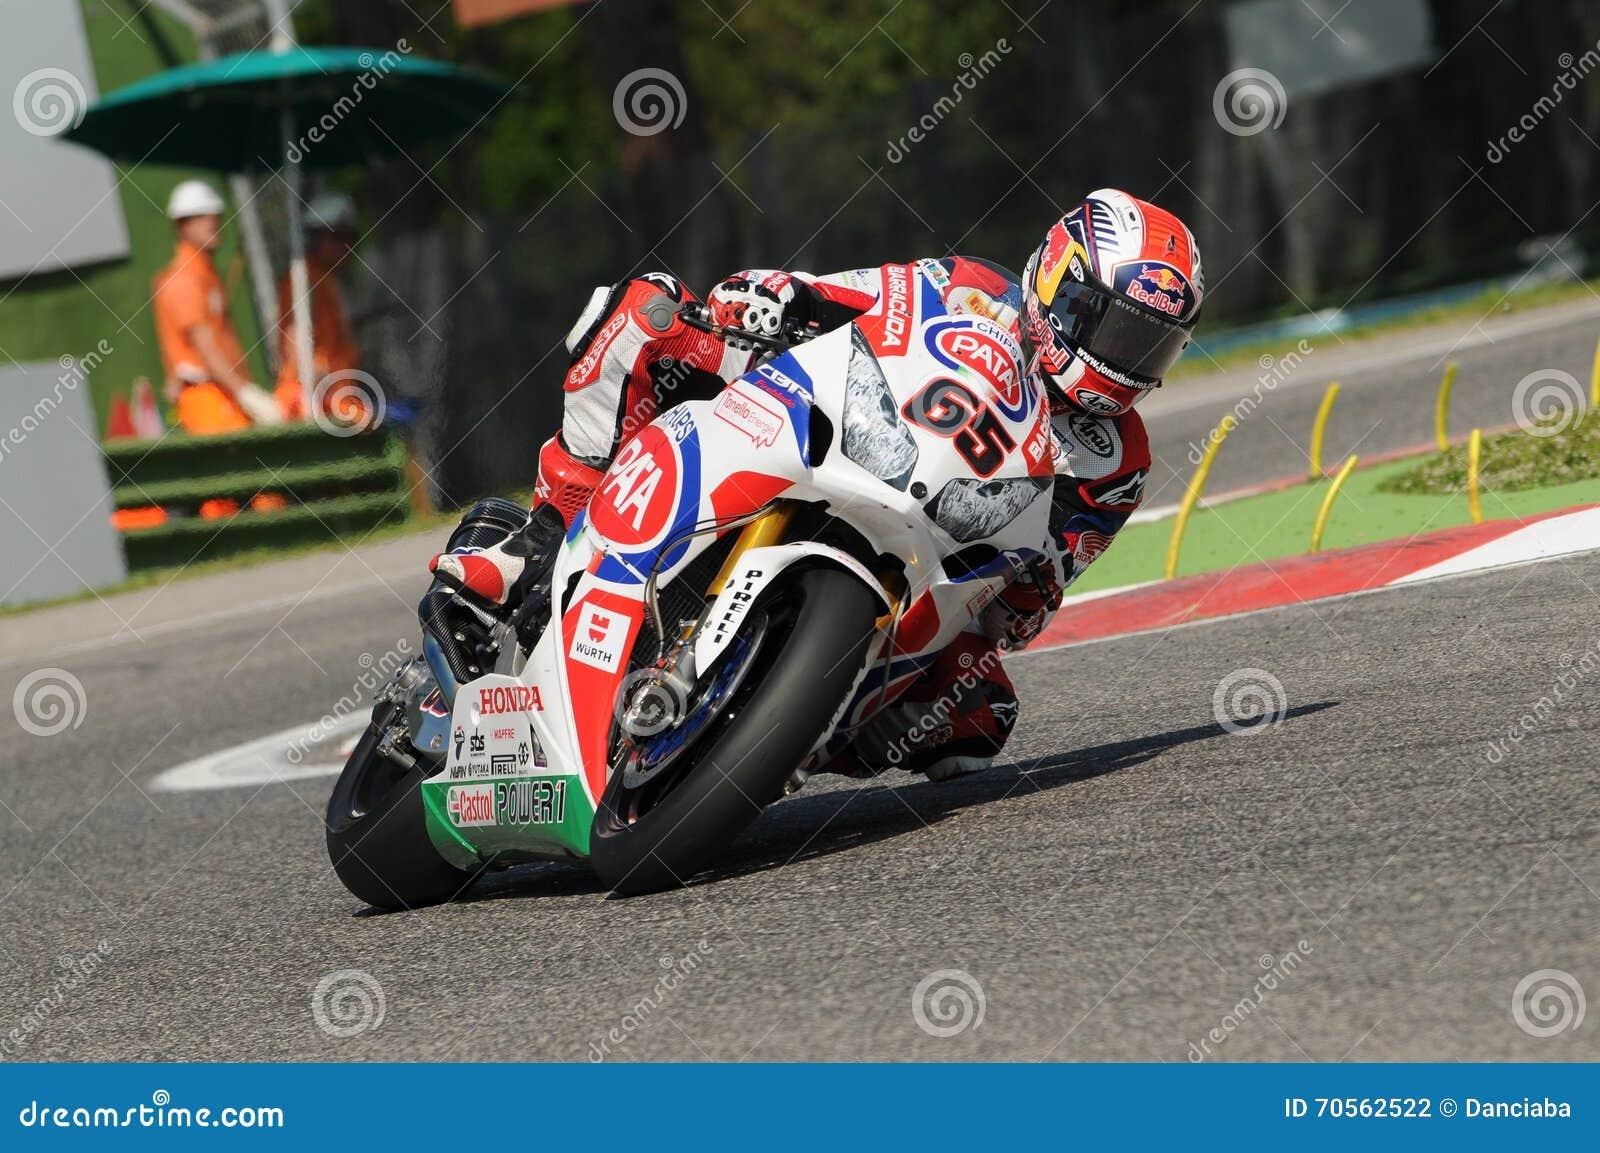 crescent racer rea